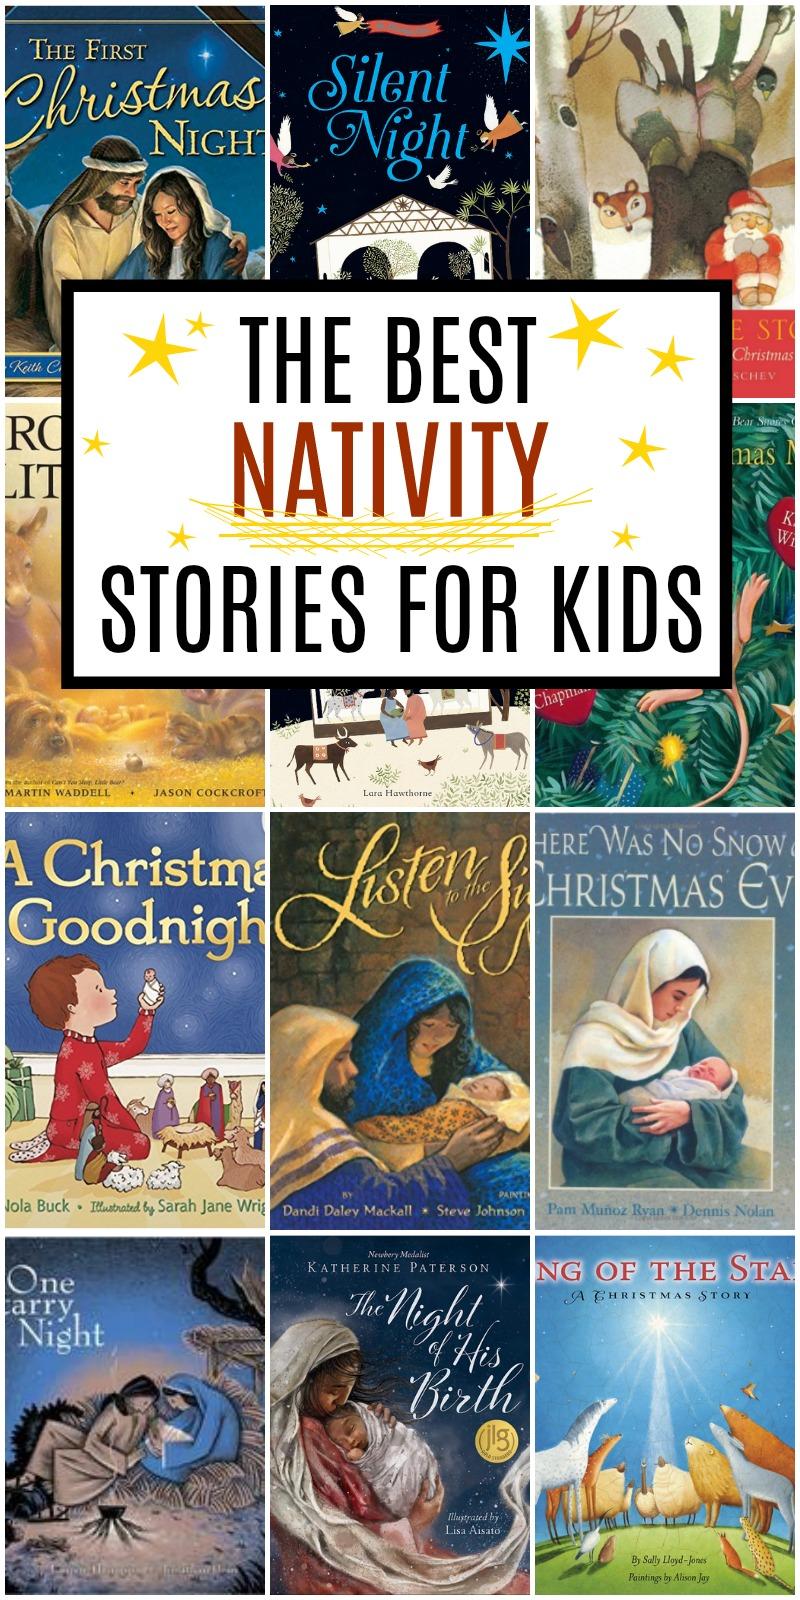 nativity story for kids